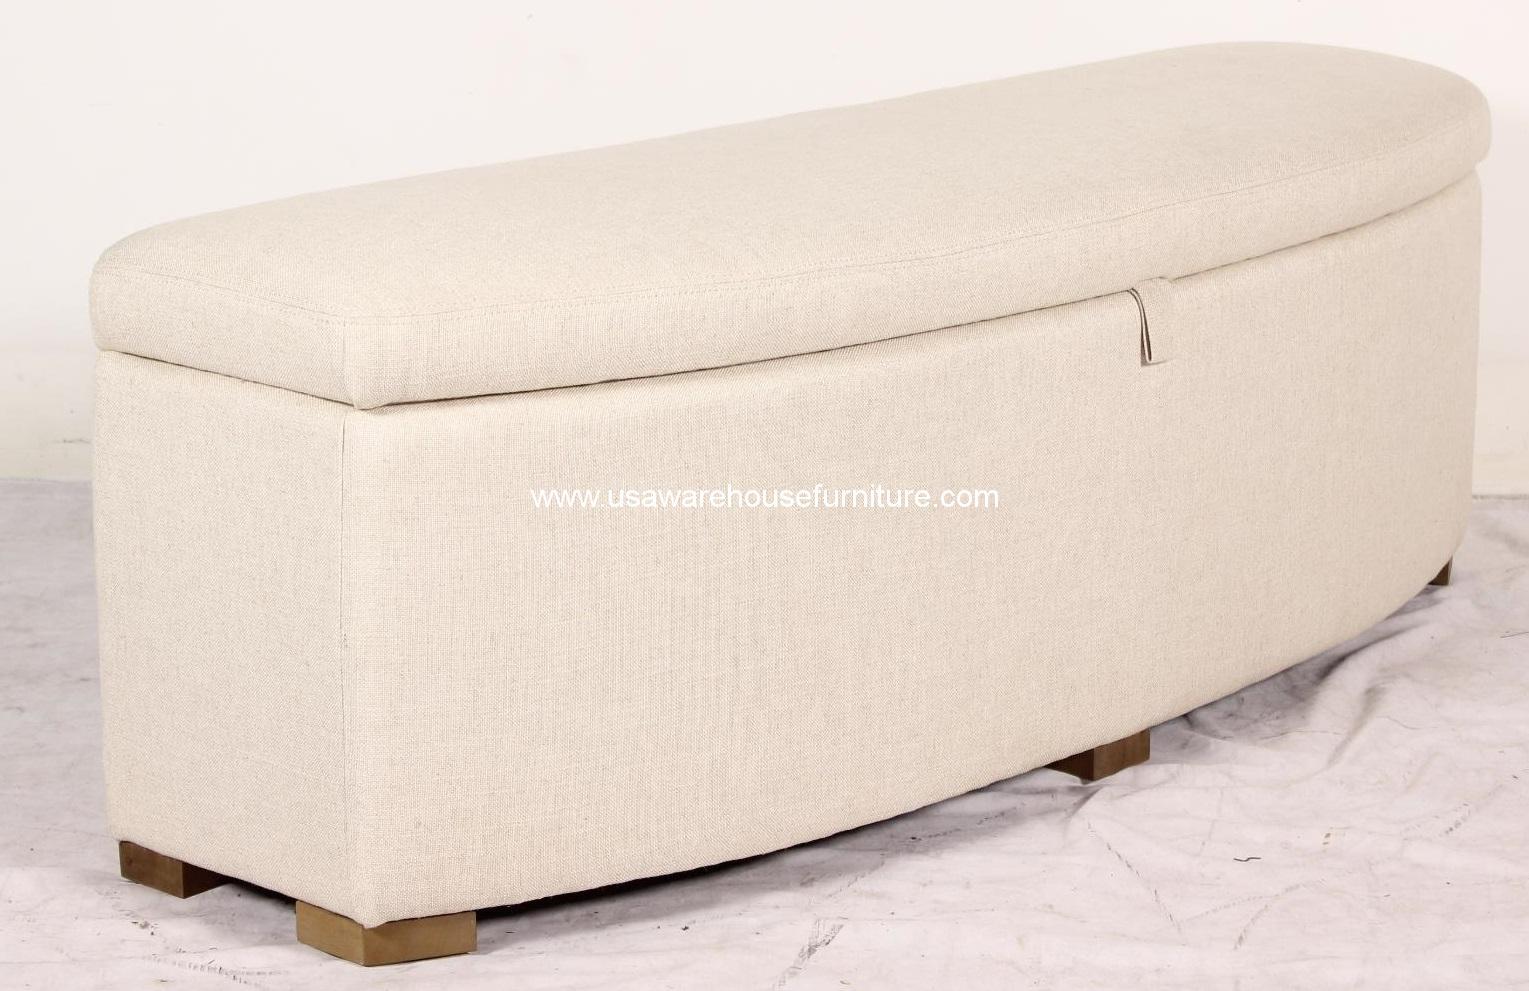 Storage ottoman fabric covered storage ottomon fabric for Storage ottoman fabric covered